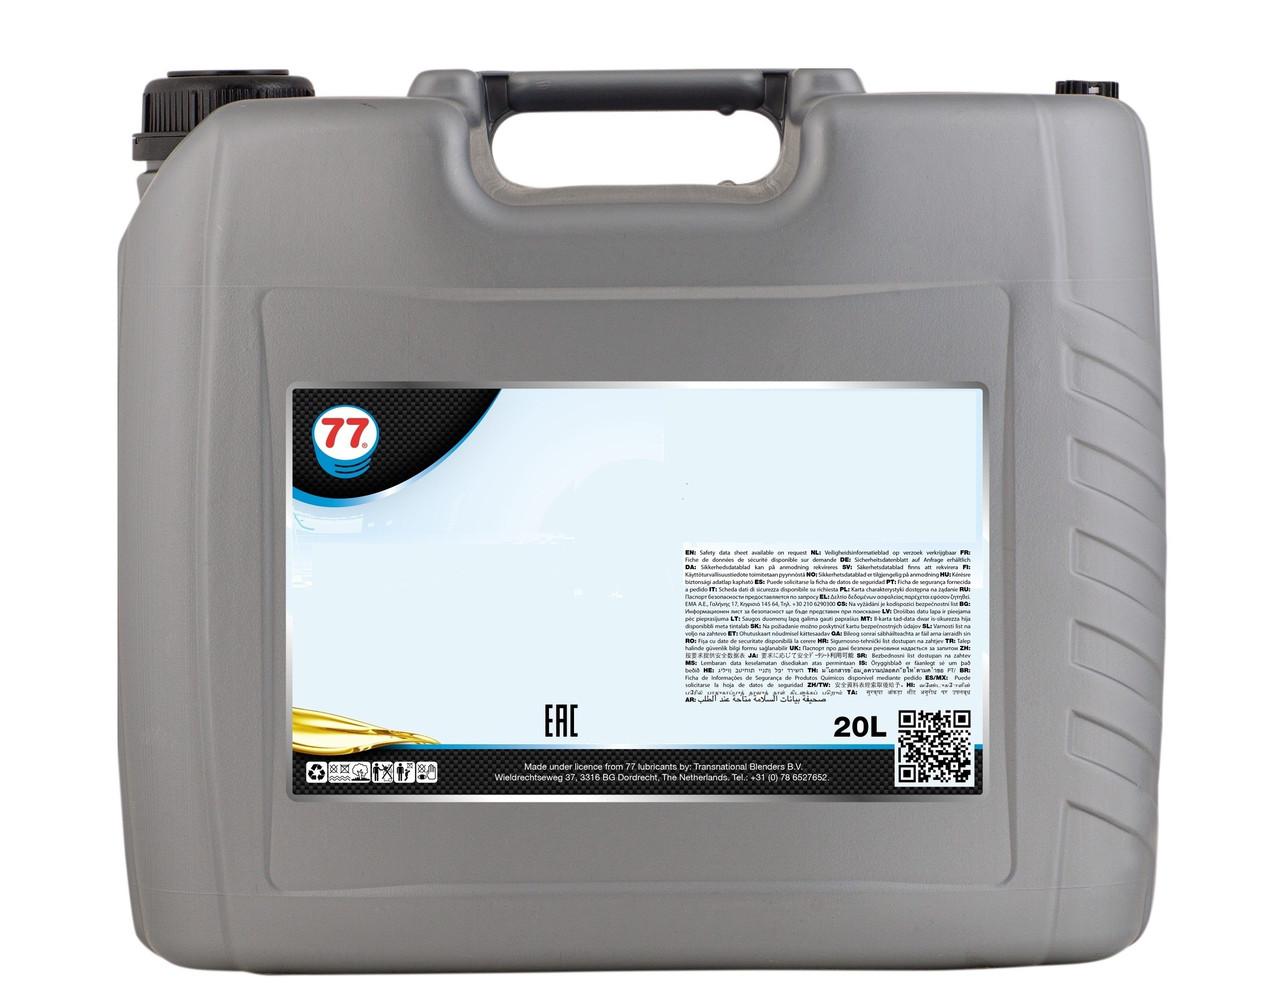 Гидравлическое без цинковое масло 77 HYDRAULIC OIL HVZF 46 (кан, 20л)